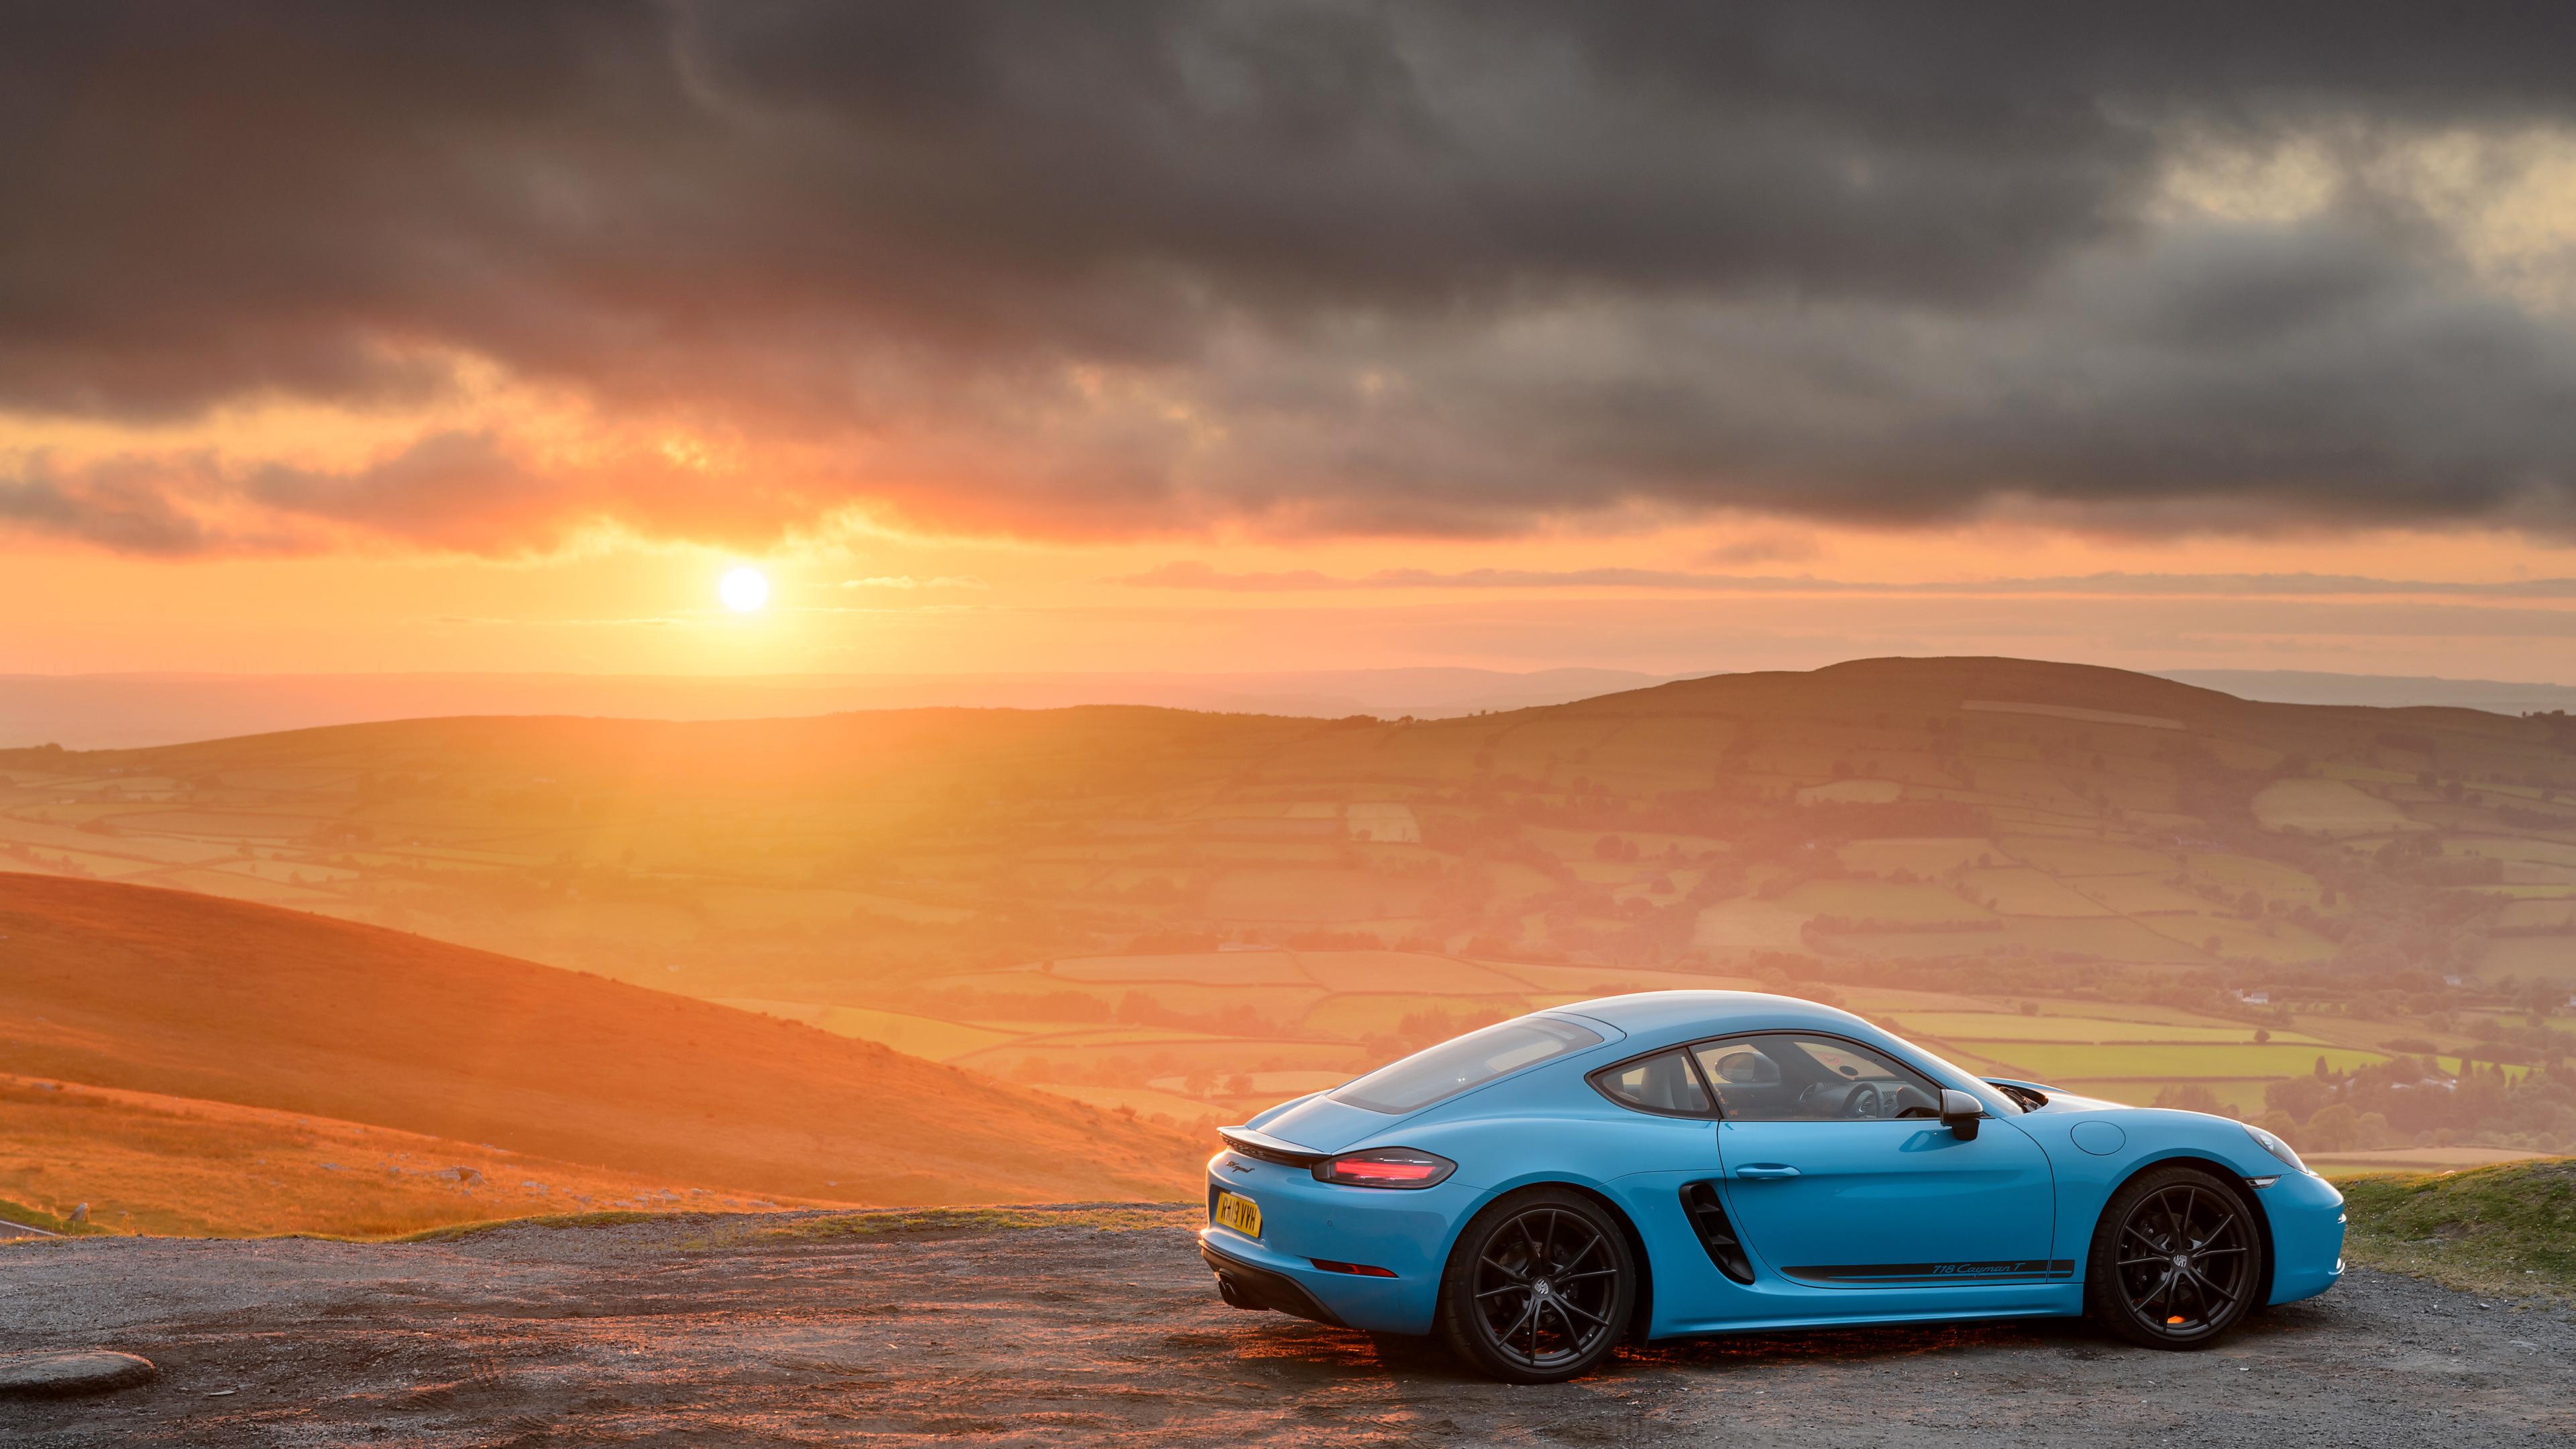 porsche 718 cayman t 1572661074 - Porsche 718 Cayman T - porsche wallpapers, porsche 718 wallpapers, hd-wallpapers, cars wallpapers, 5k wallpapers, 4k-wallpapers, 2019 cars wallpapers